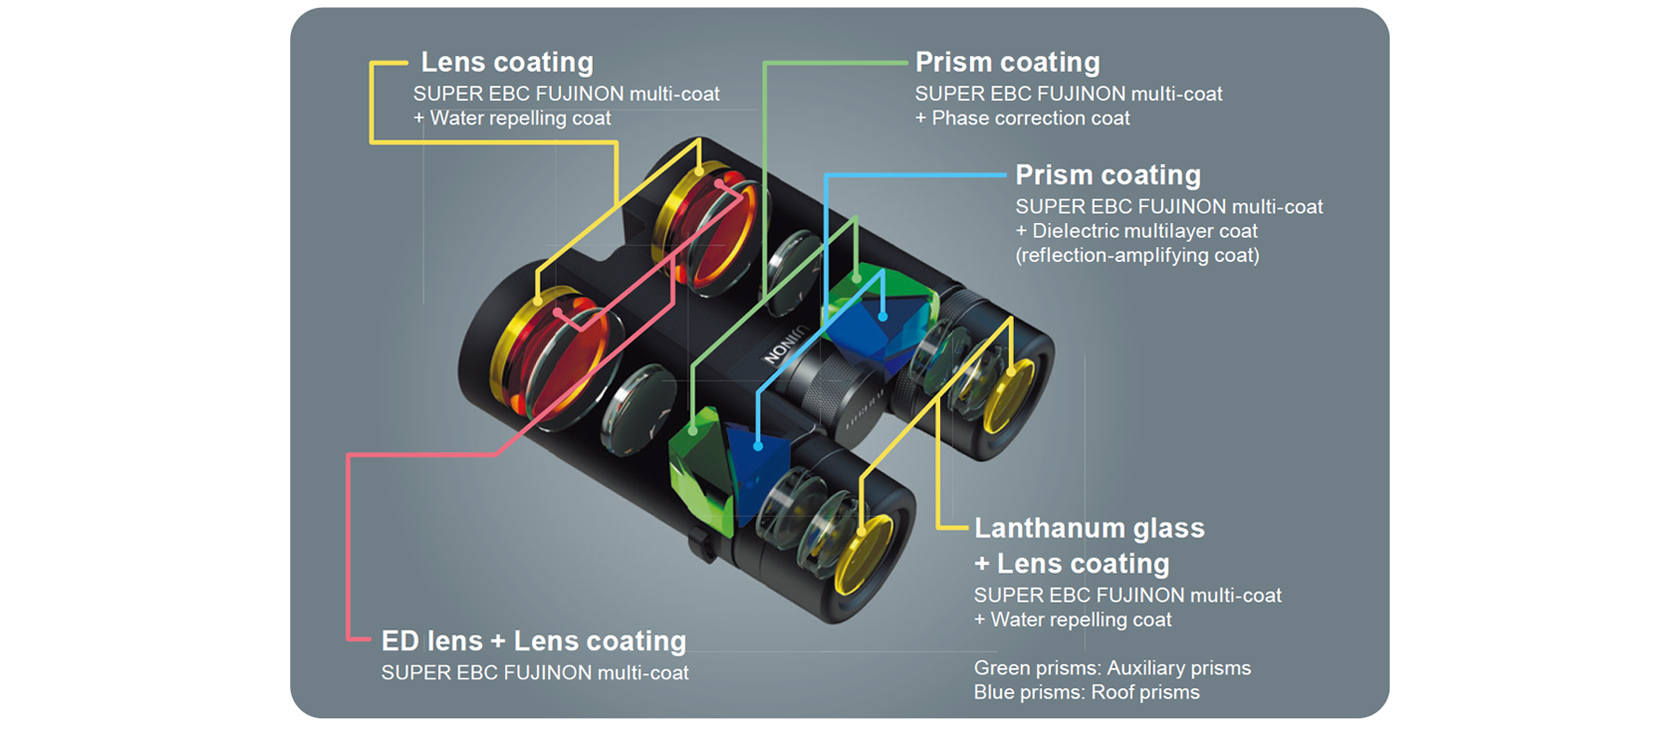 [image] Hyper-Clarity Series binoculars internal parts